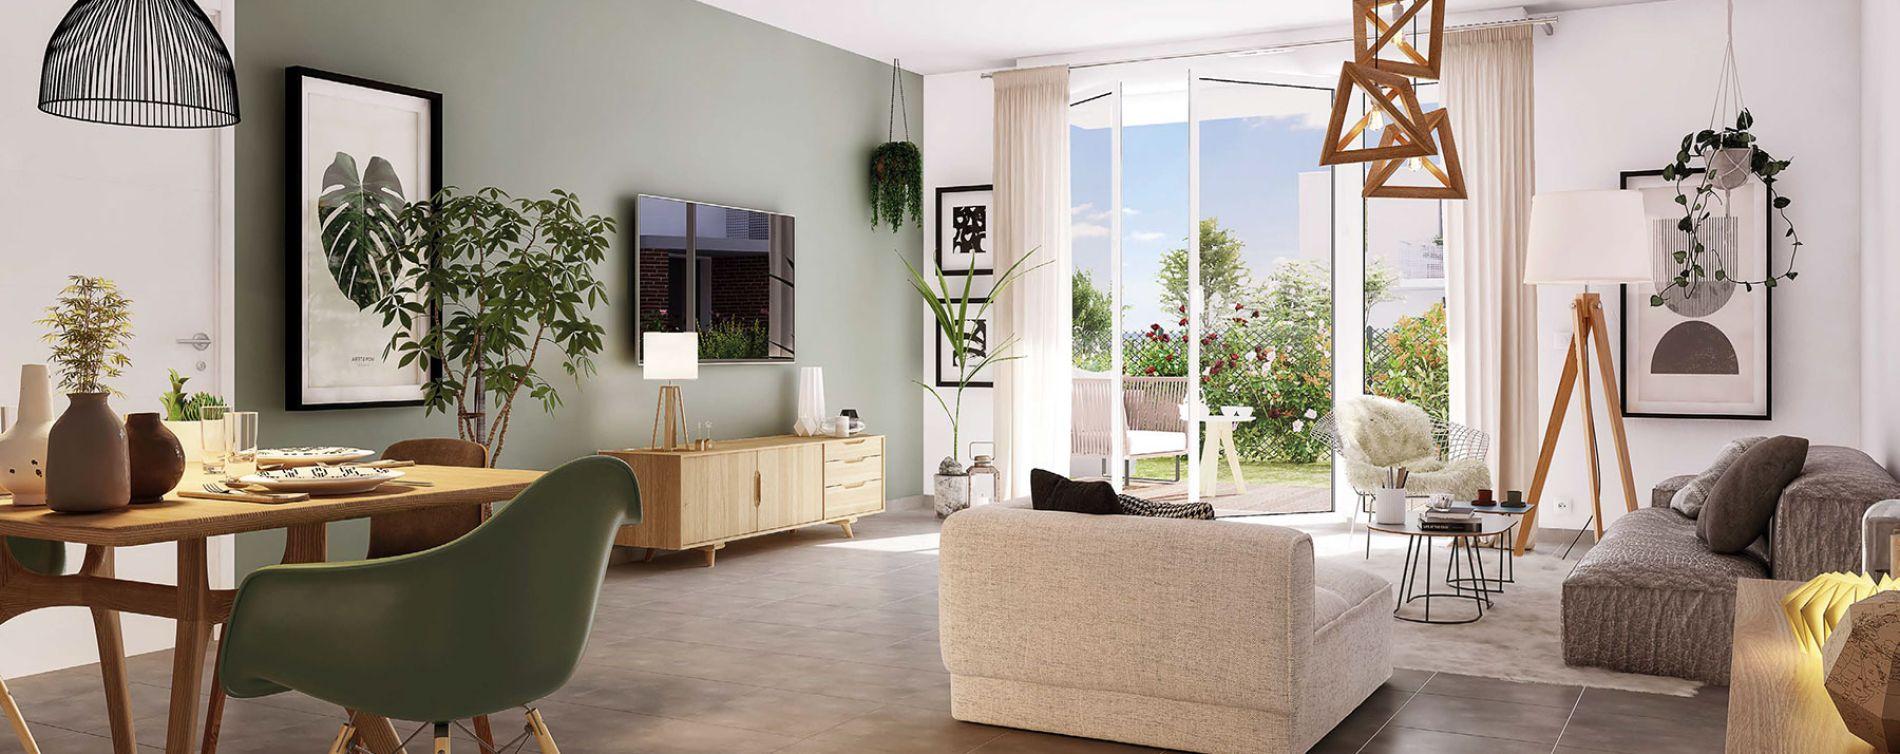 Mondonville : programme immobilier neuve « Programme immobilier n°218335 » (3)